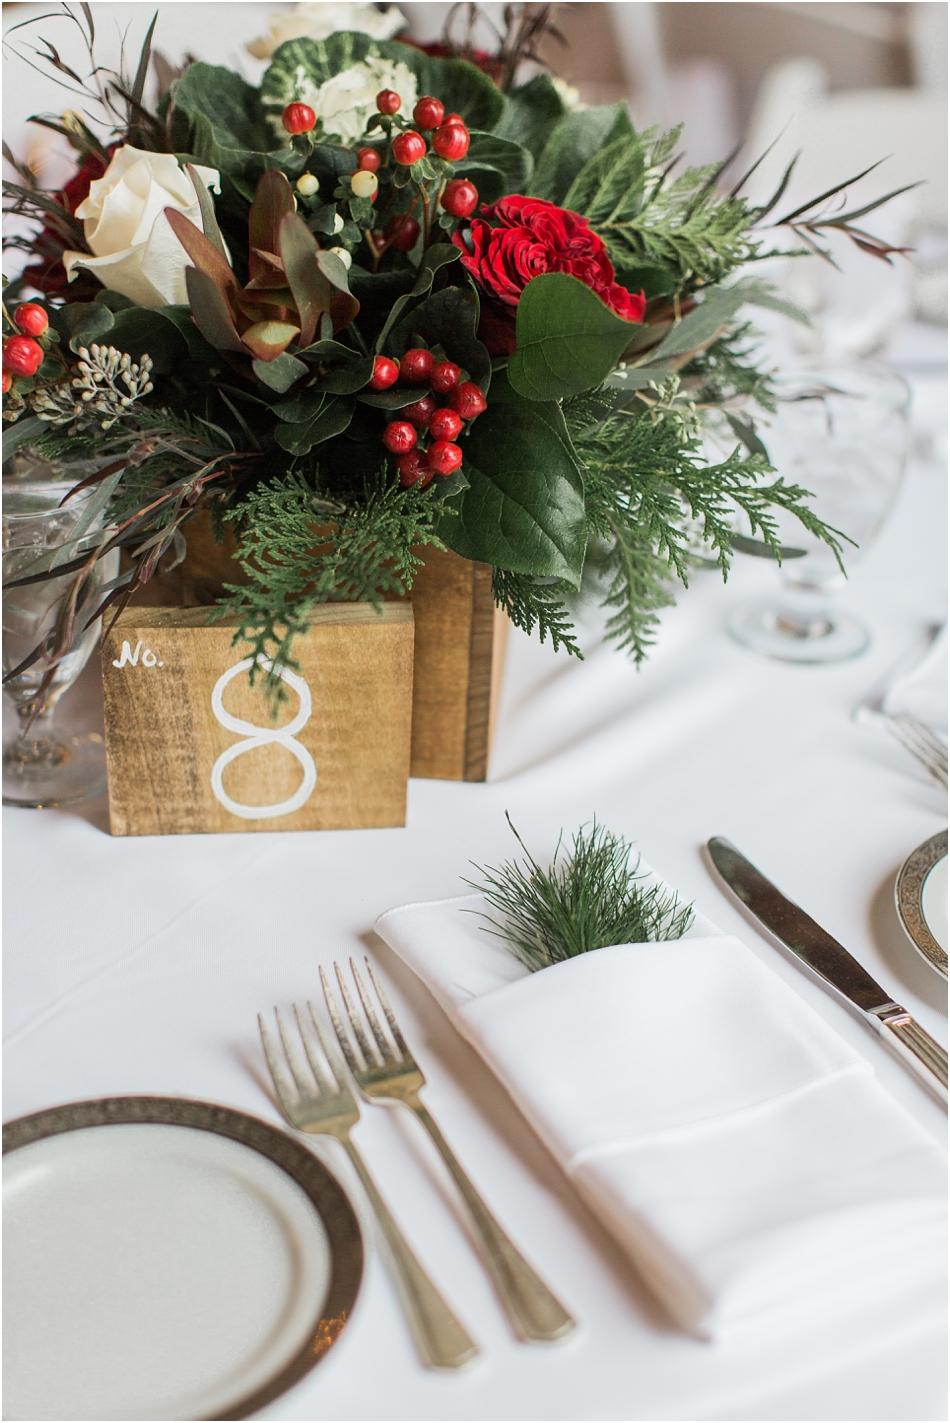 peirce_farm_winter_christmas_jessica_john_cape_cod_boston_new_england_wedding_photographer_Meredith_Jane_Photography_photo_0340.jpg